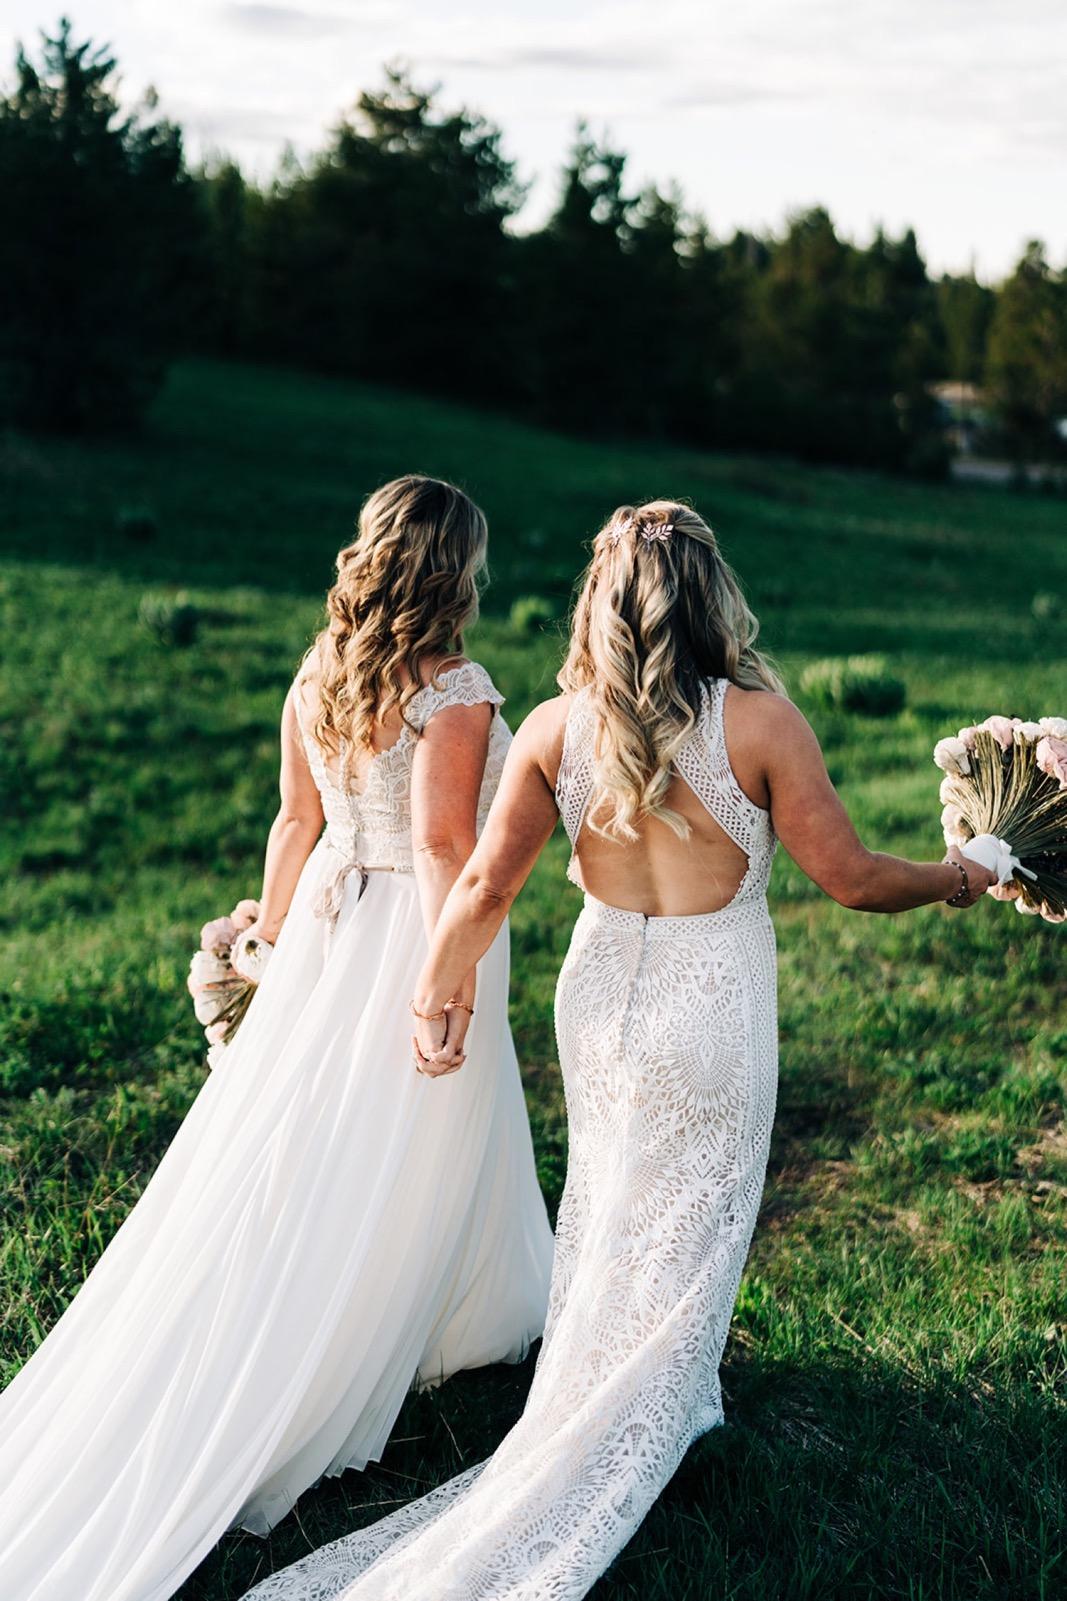 167_falissa_heather_wedding-481.jpg